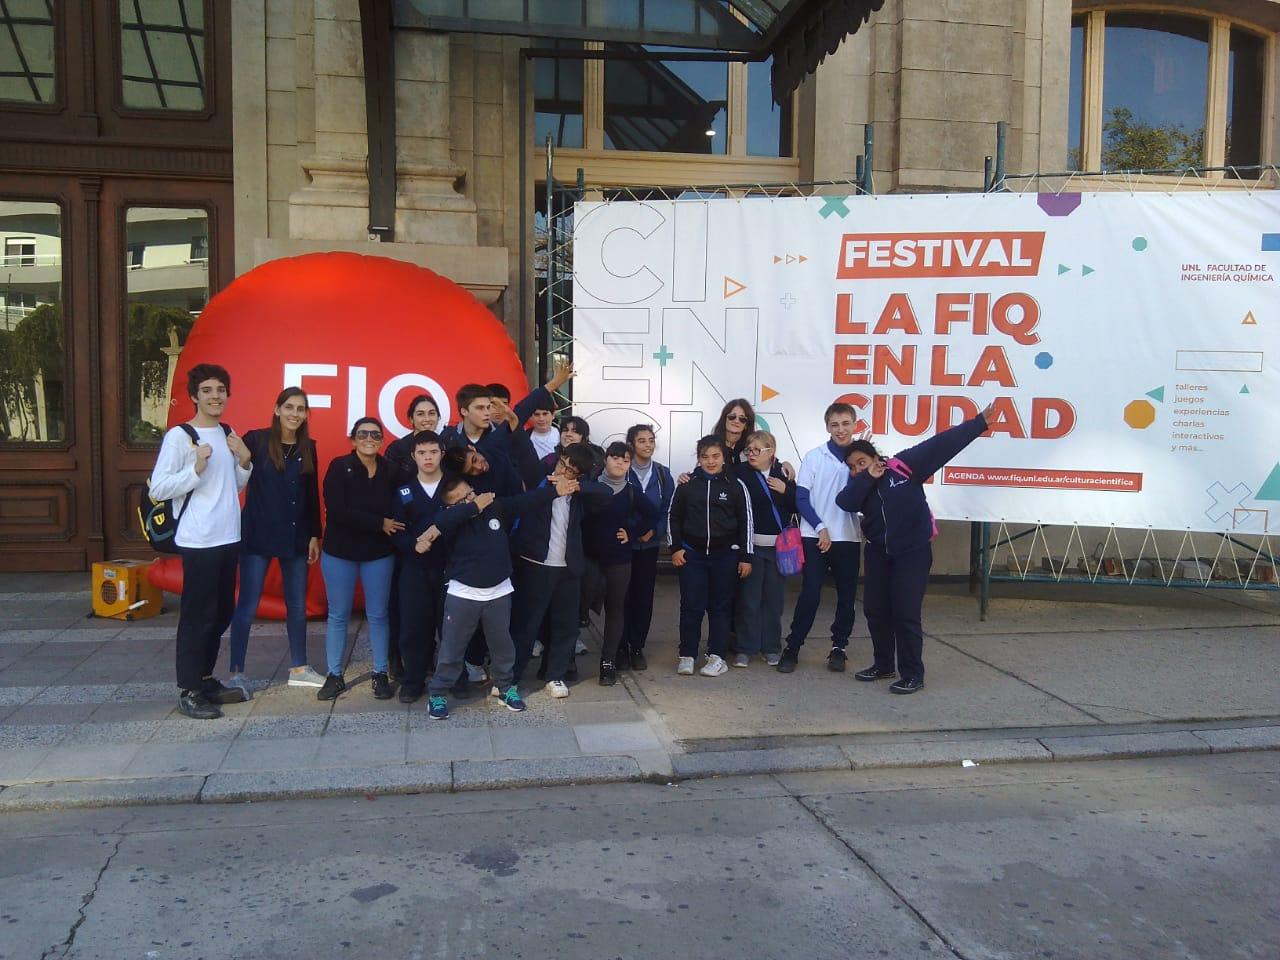 Visita al Festival la FIQ en la Ciudad